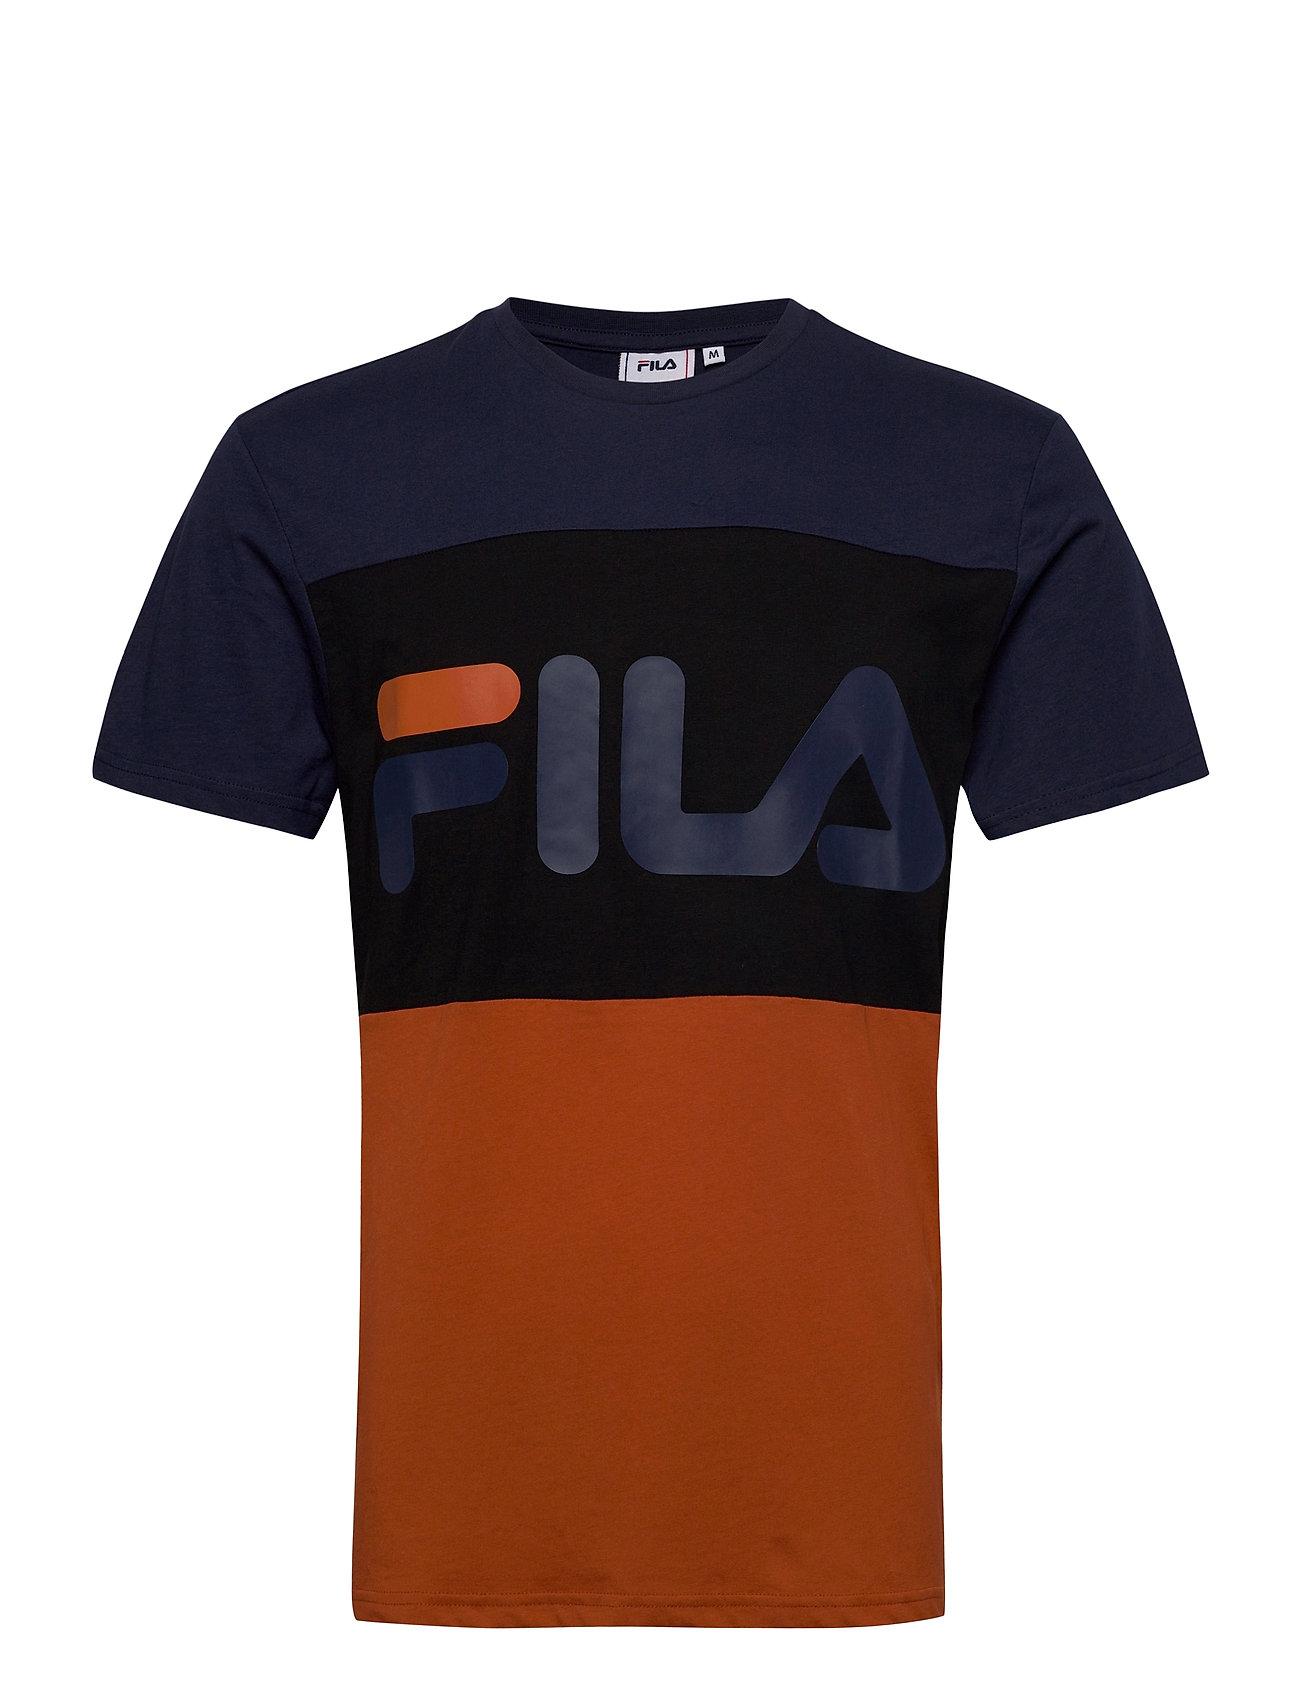 Image of Day Tee T-shirt Multi/mønstret FILA (3456635489)